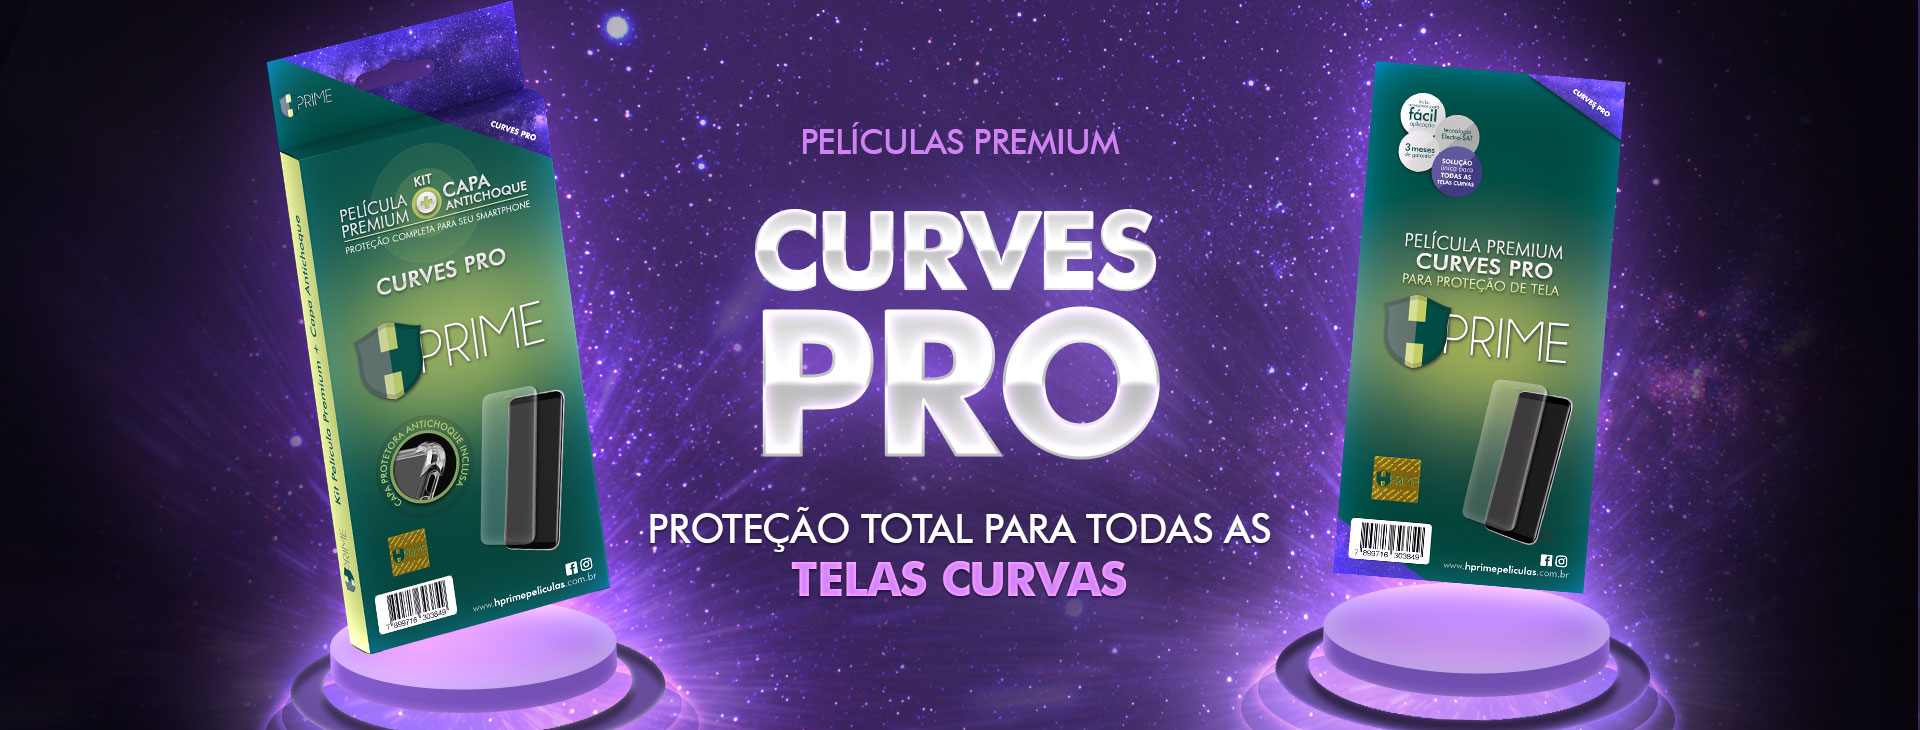 CURVES PRO